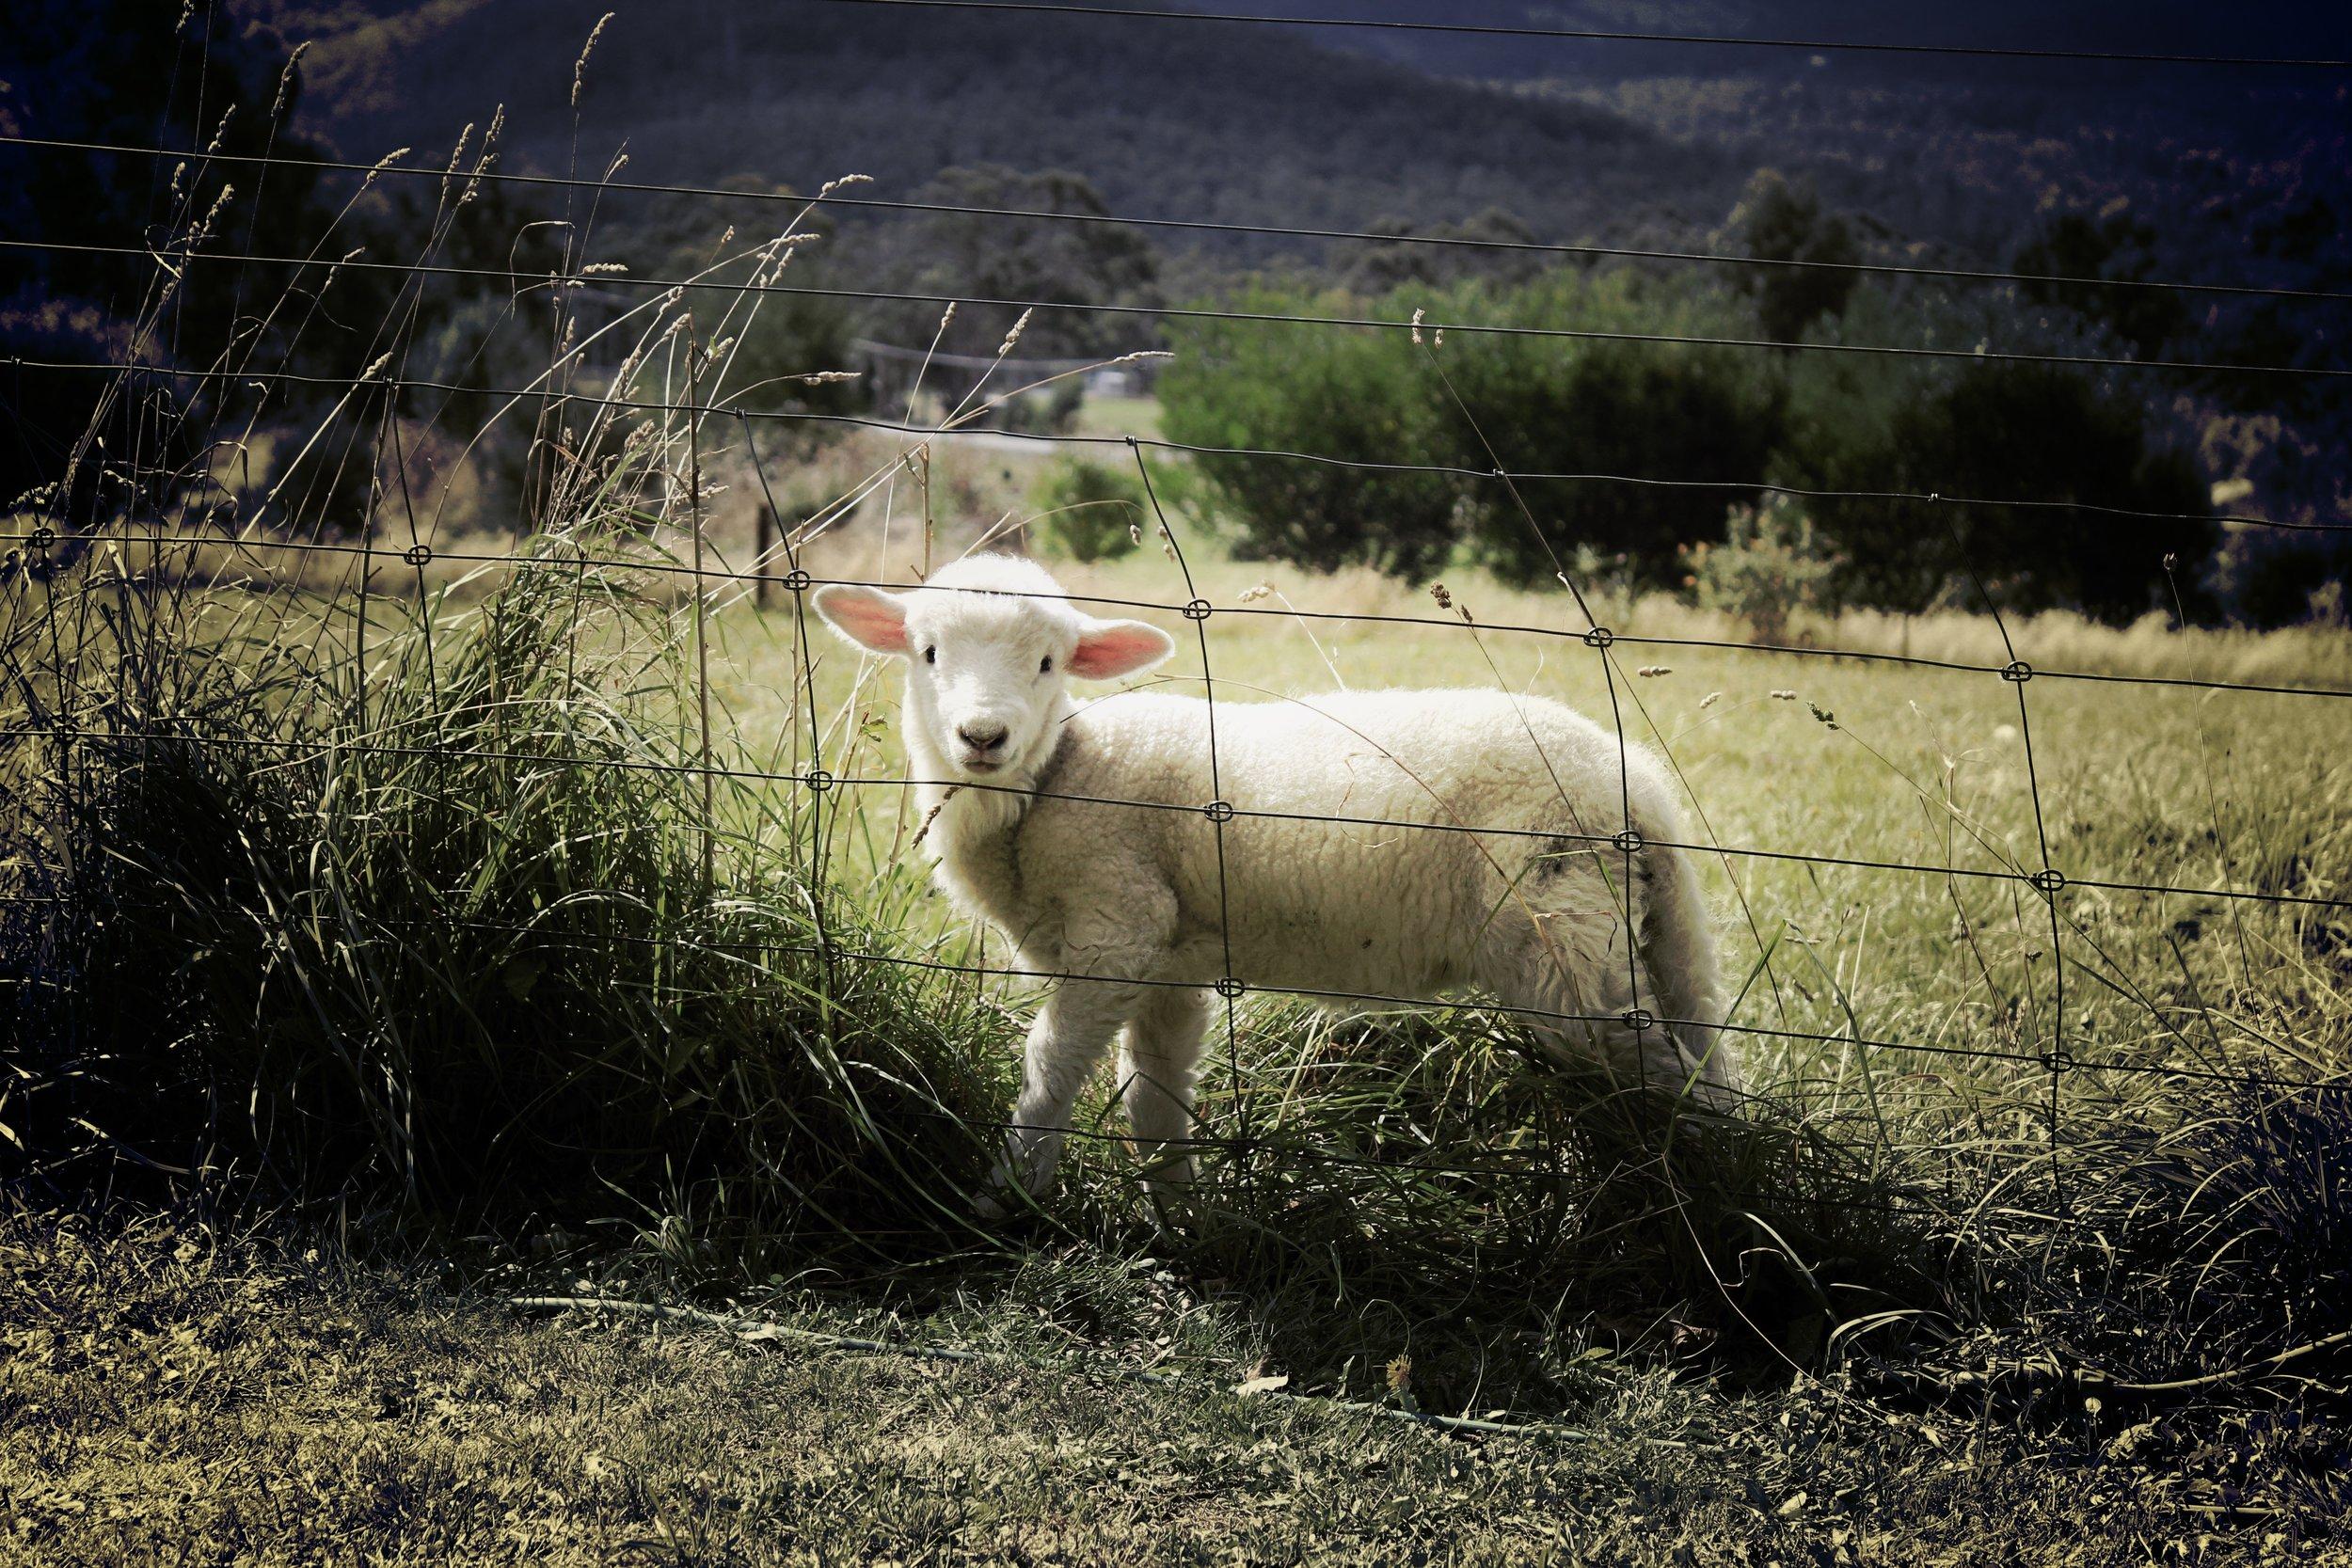 animal-countryside-farm-47078.jpg